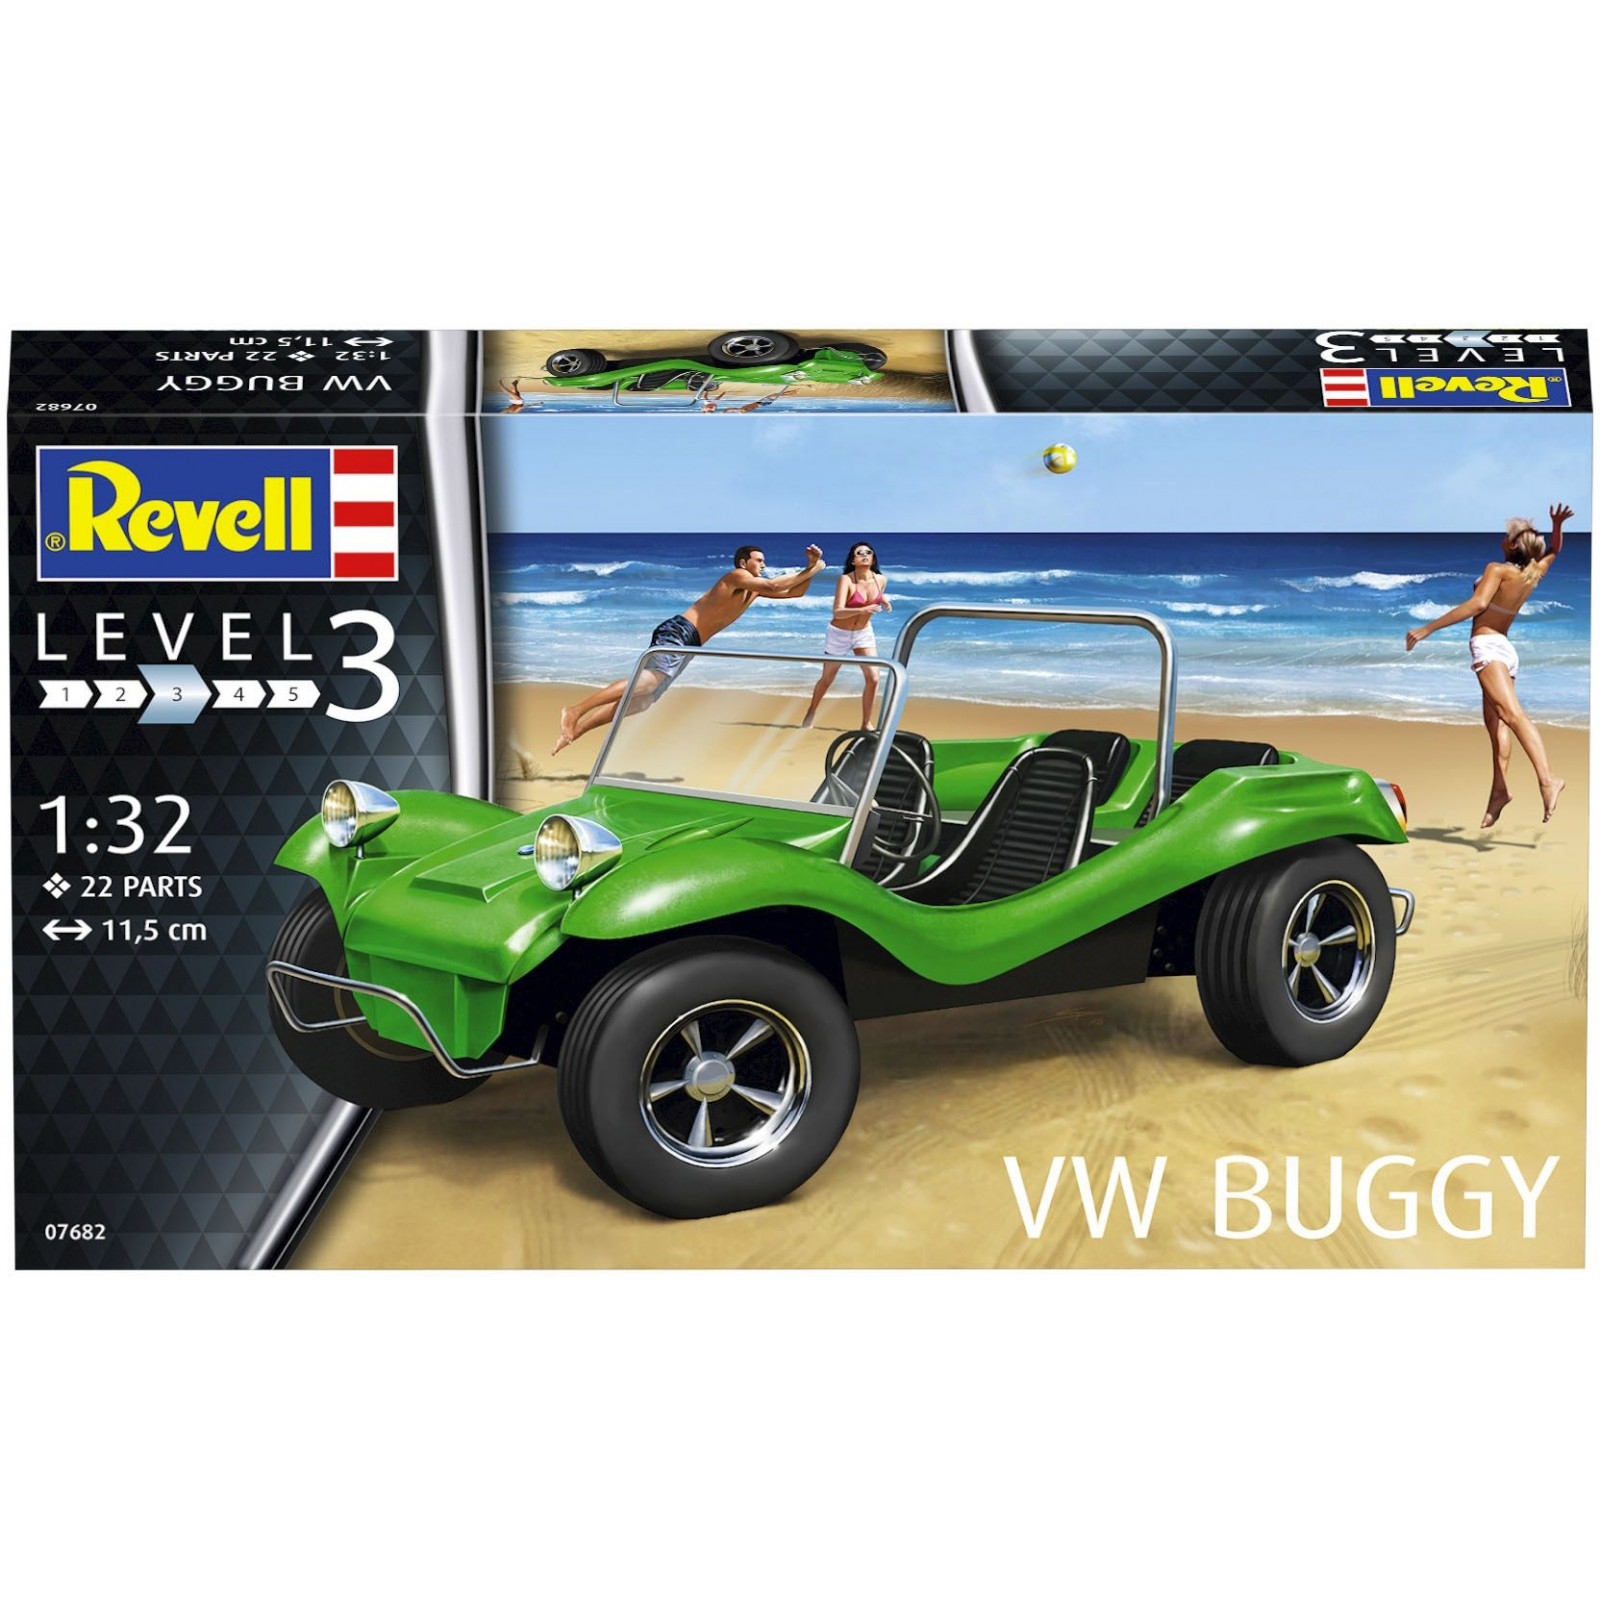 Revell VW Buggy (1:32) Skill 3 - 07682